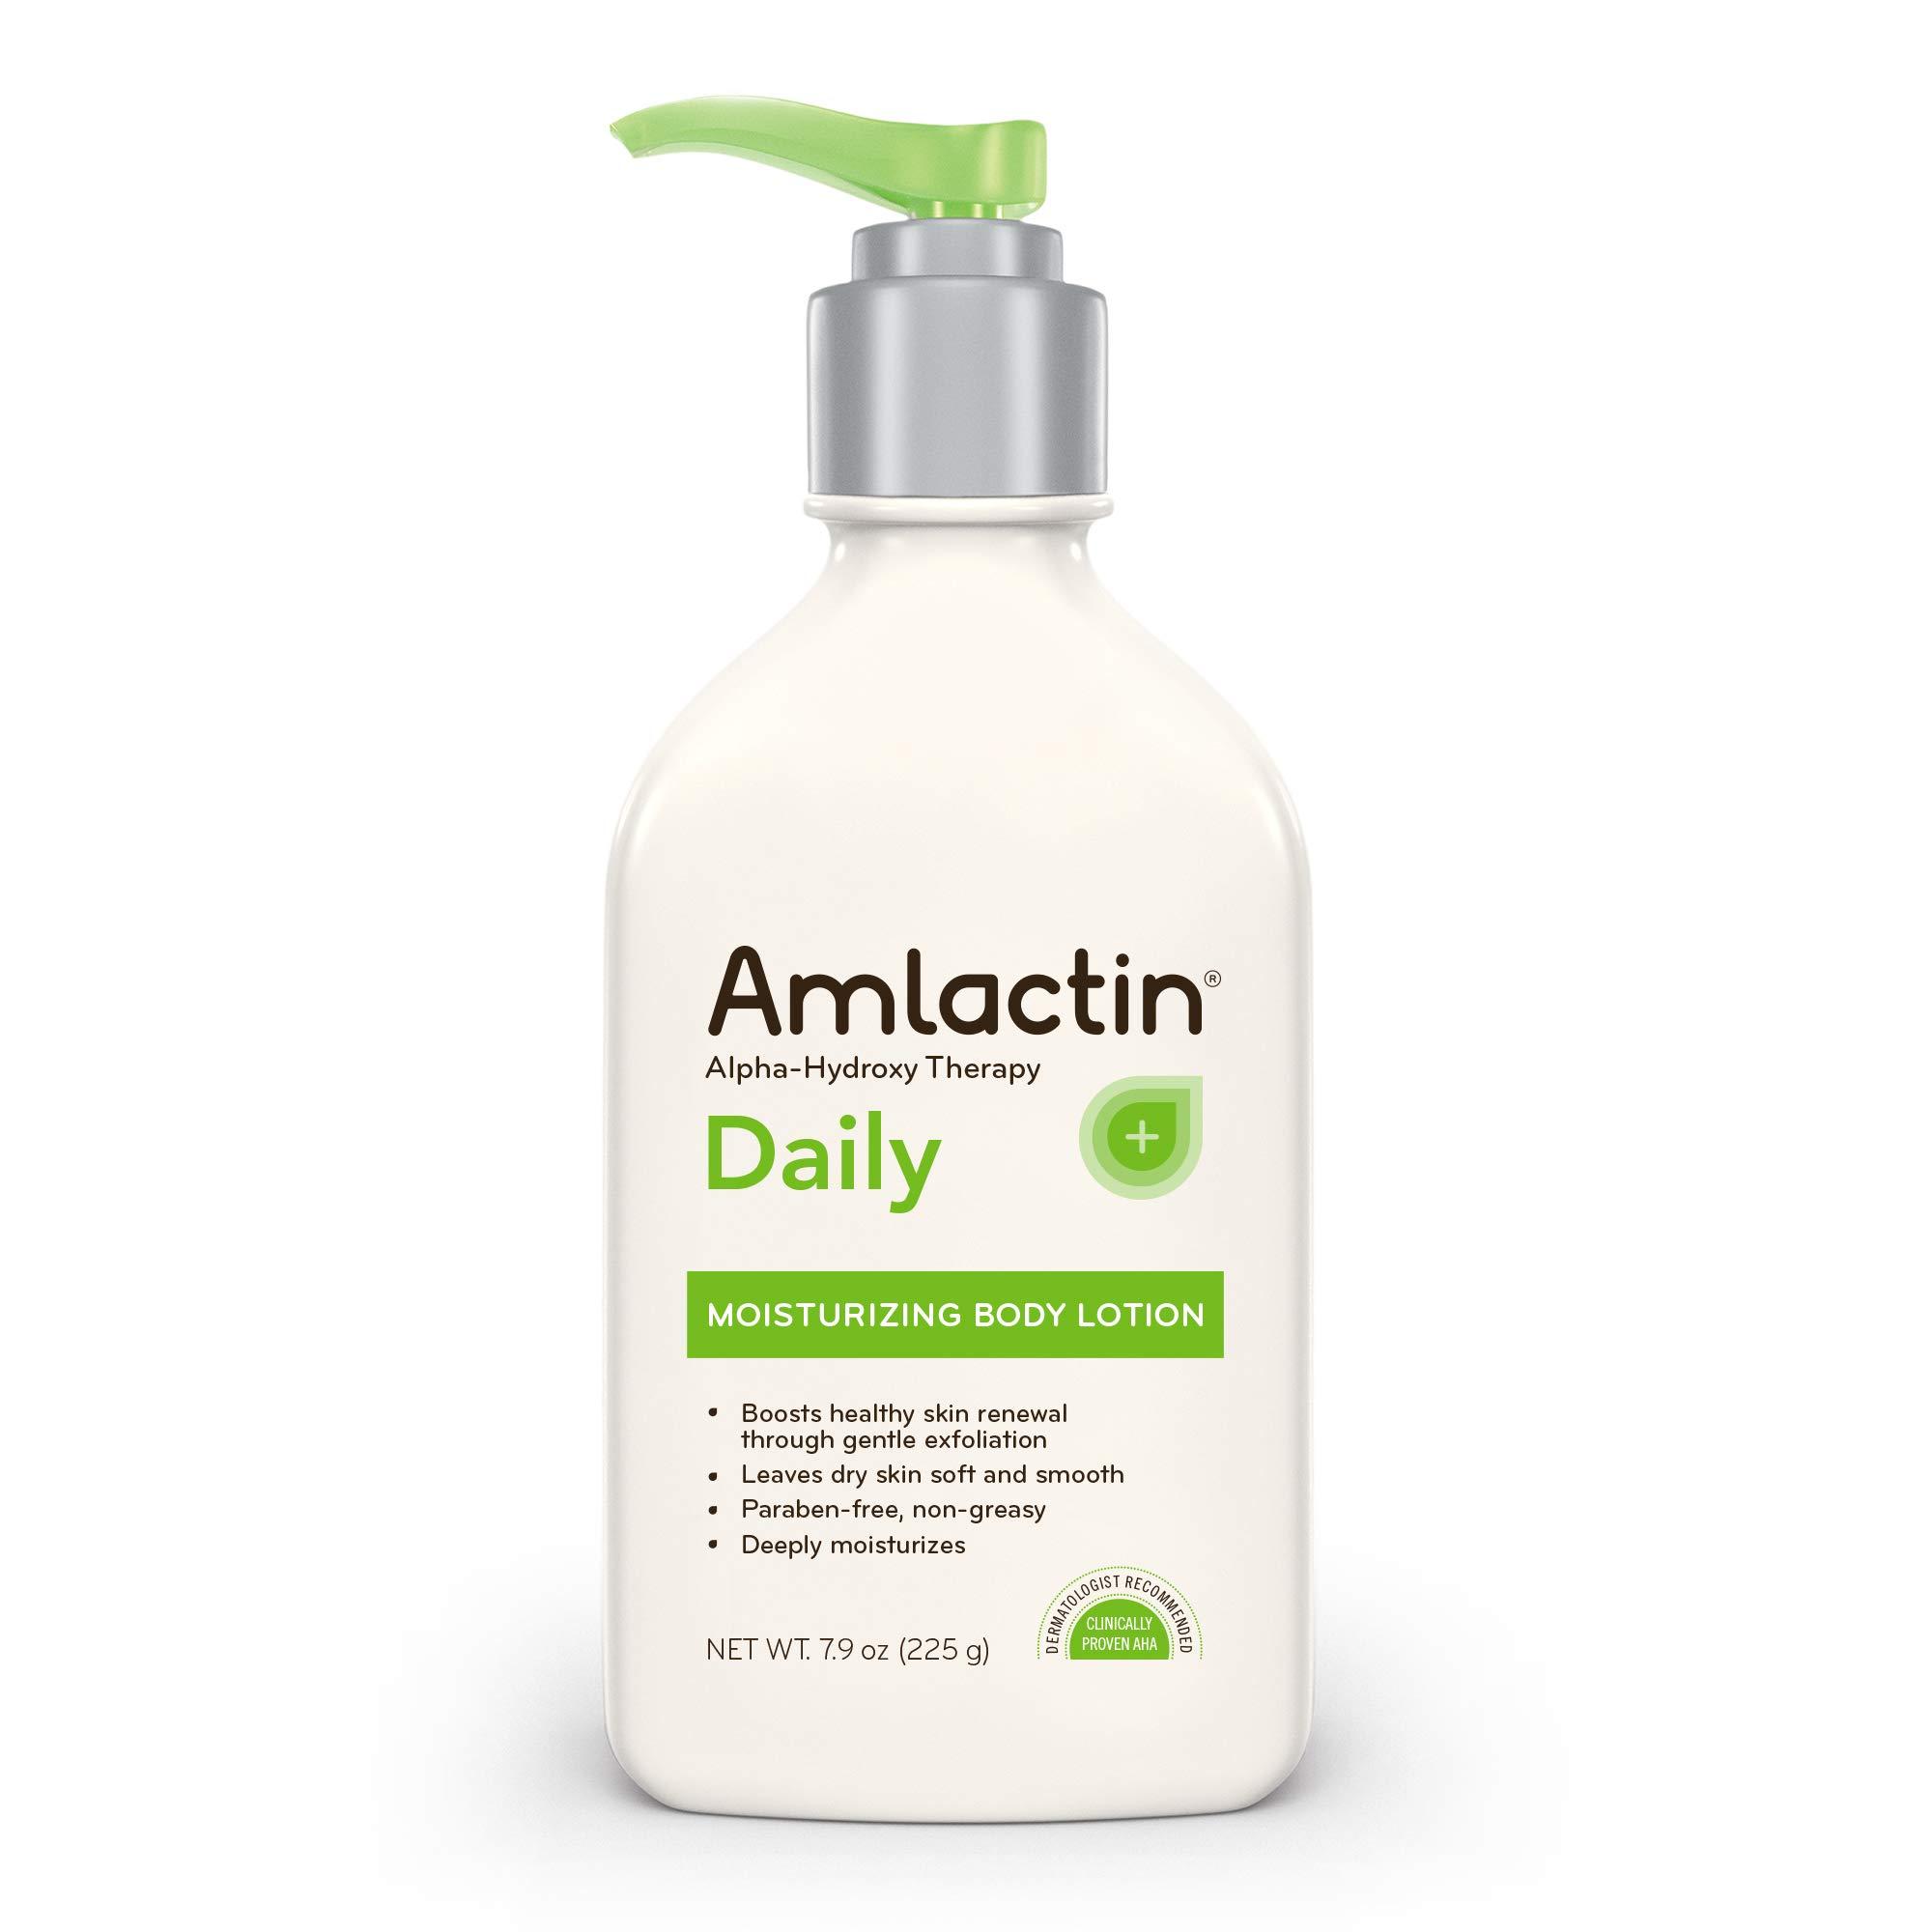 AmLactin Daily Moisturizing Body Lotion, 7.9 Ounce Bottle, Paraben Free by AmLactin